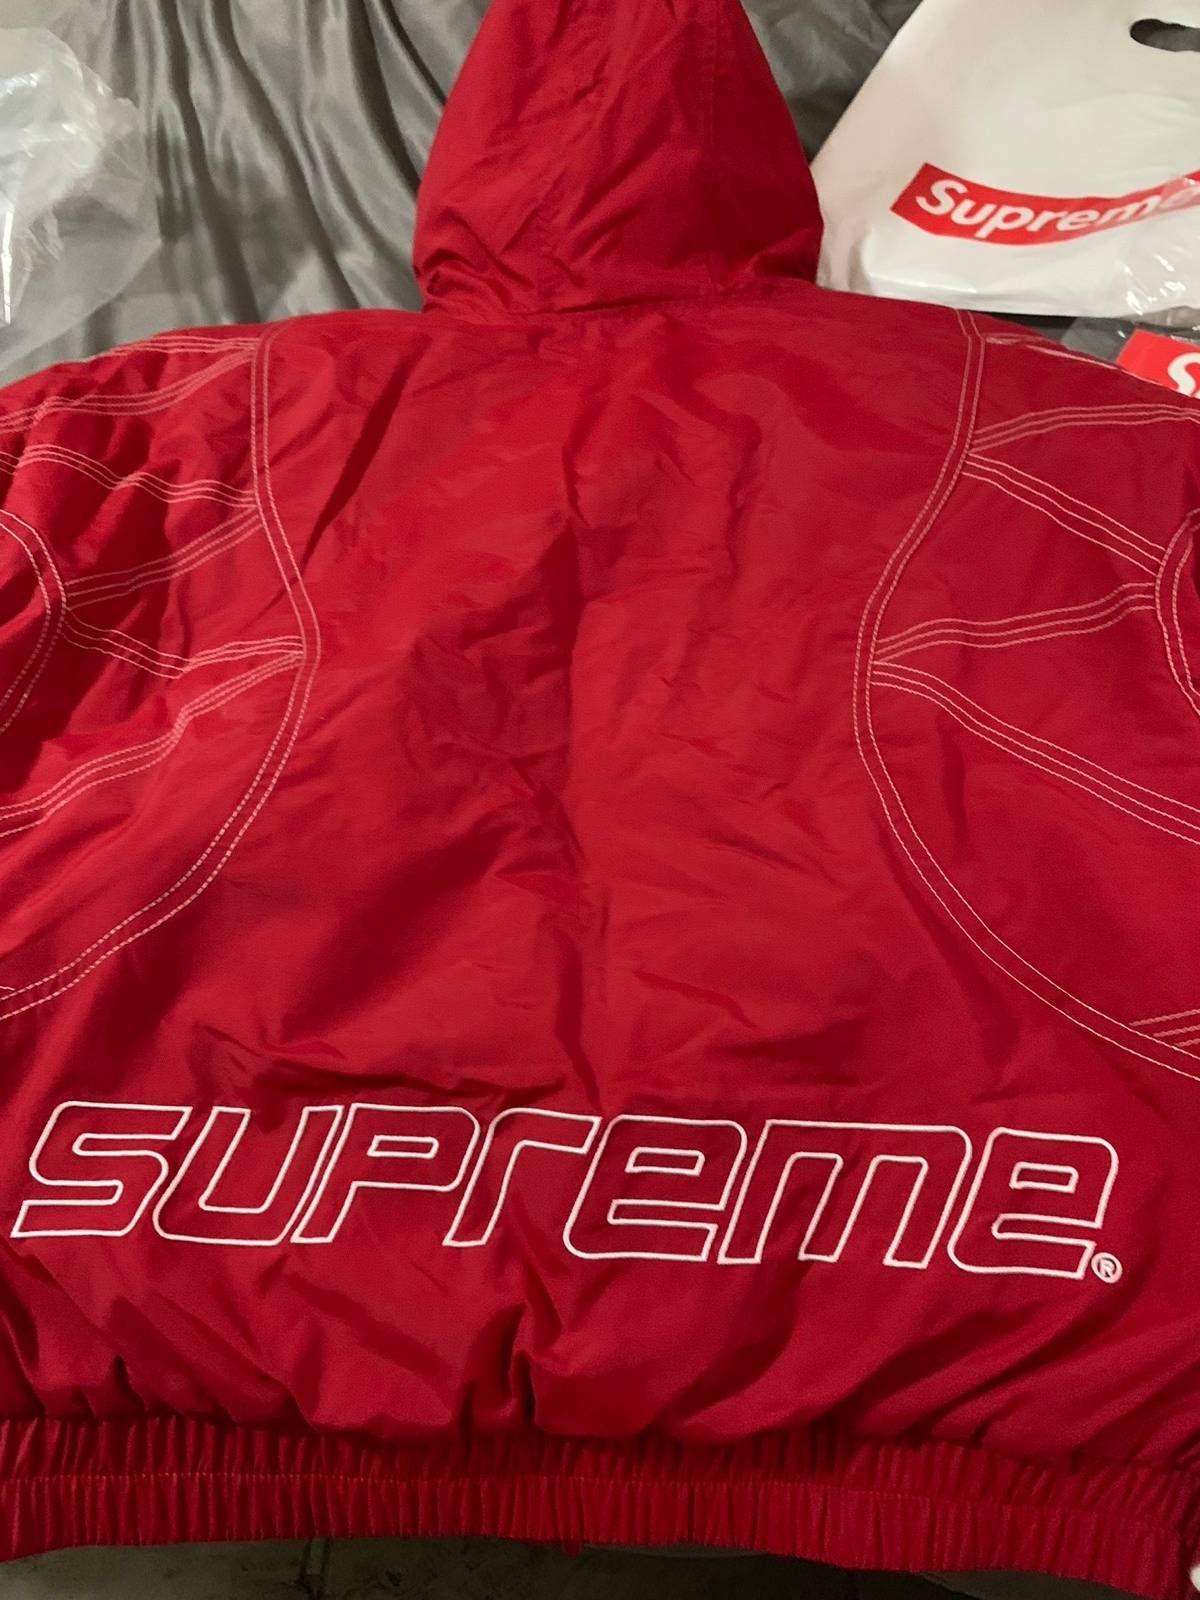 d46bc2e8 Supreme Supreme Zig Zag Stitch Puffy Jacket Size m - Light Jackets for Sale  - Grailed